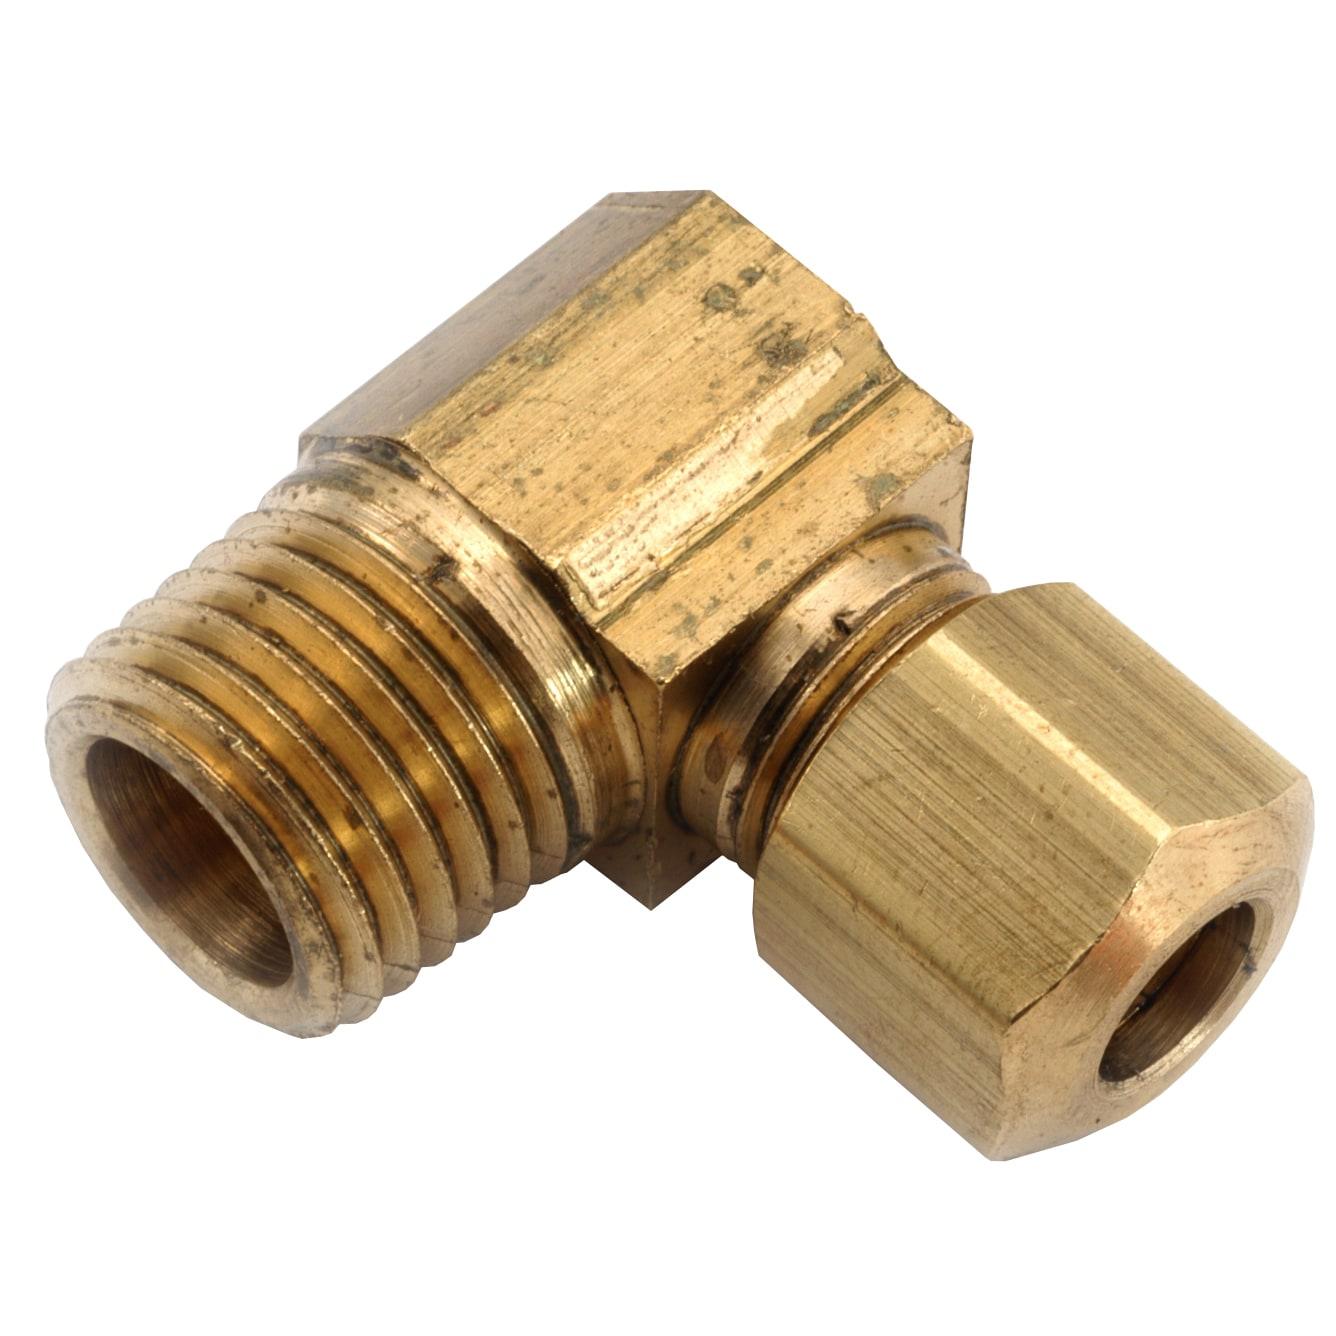 Amc 750069-0604 3/8 X 1/4 Brass Low Lead Male Elbow (Elbow 3/8x1/4ll)